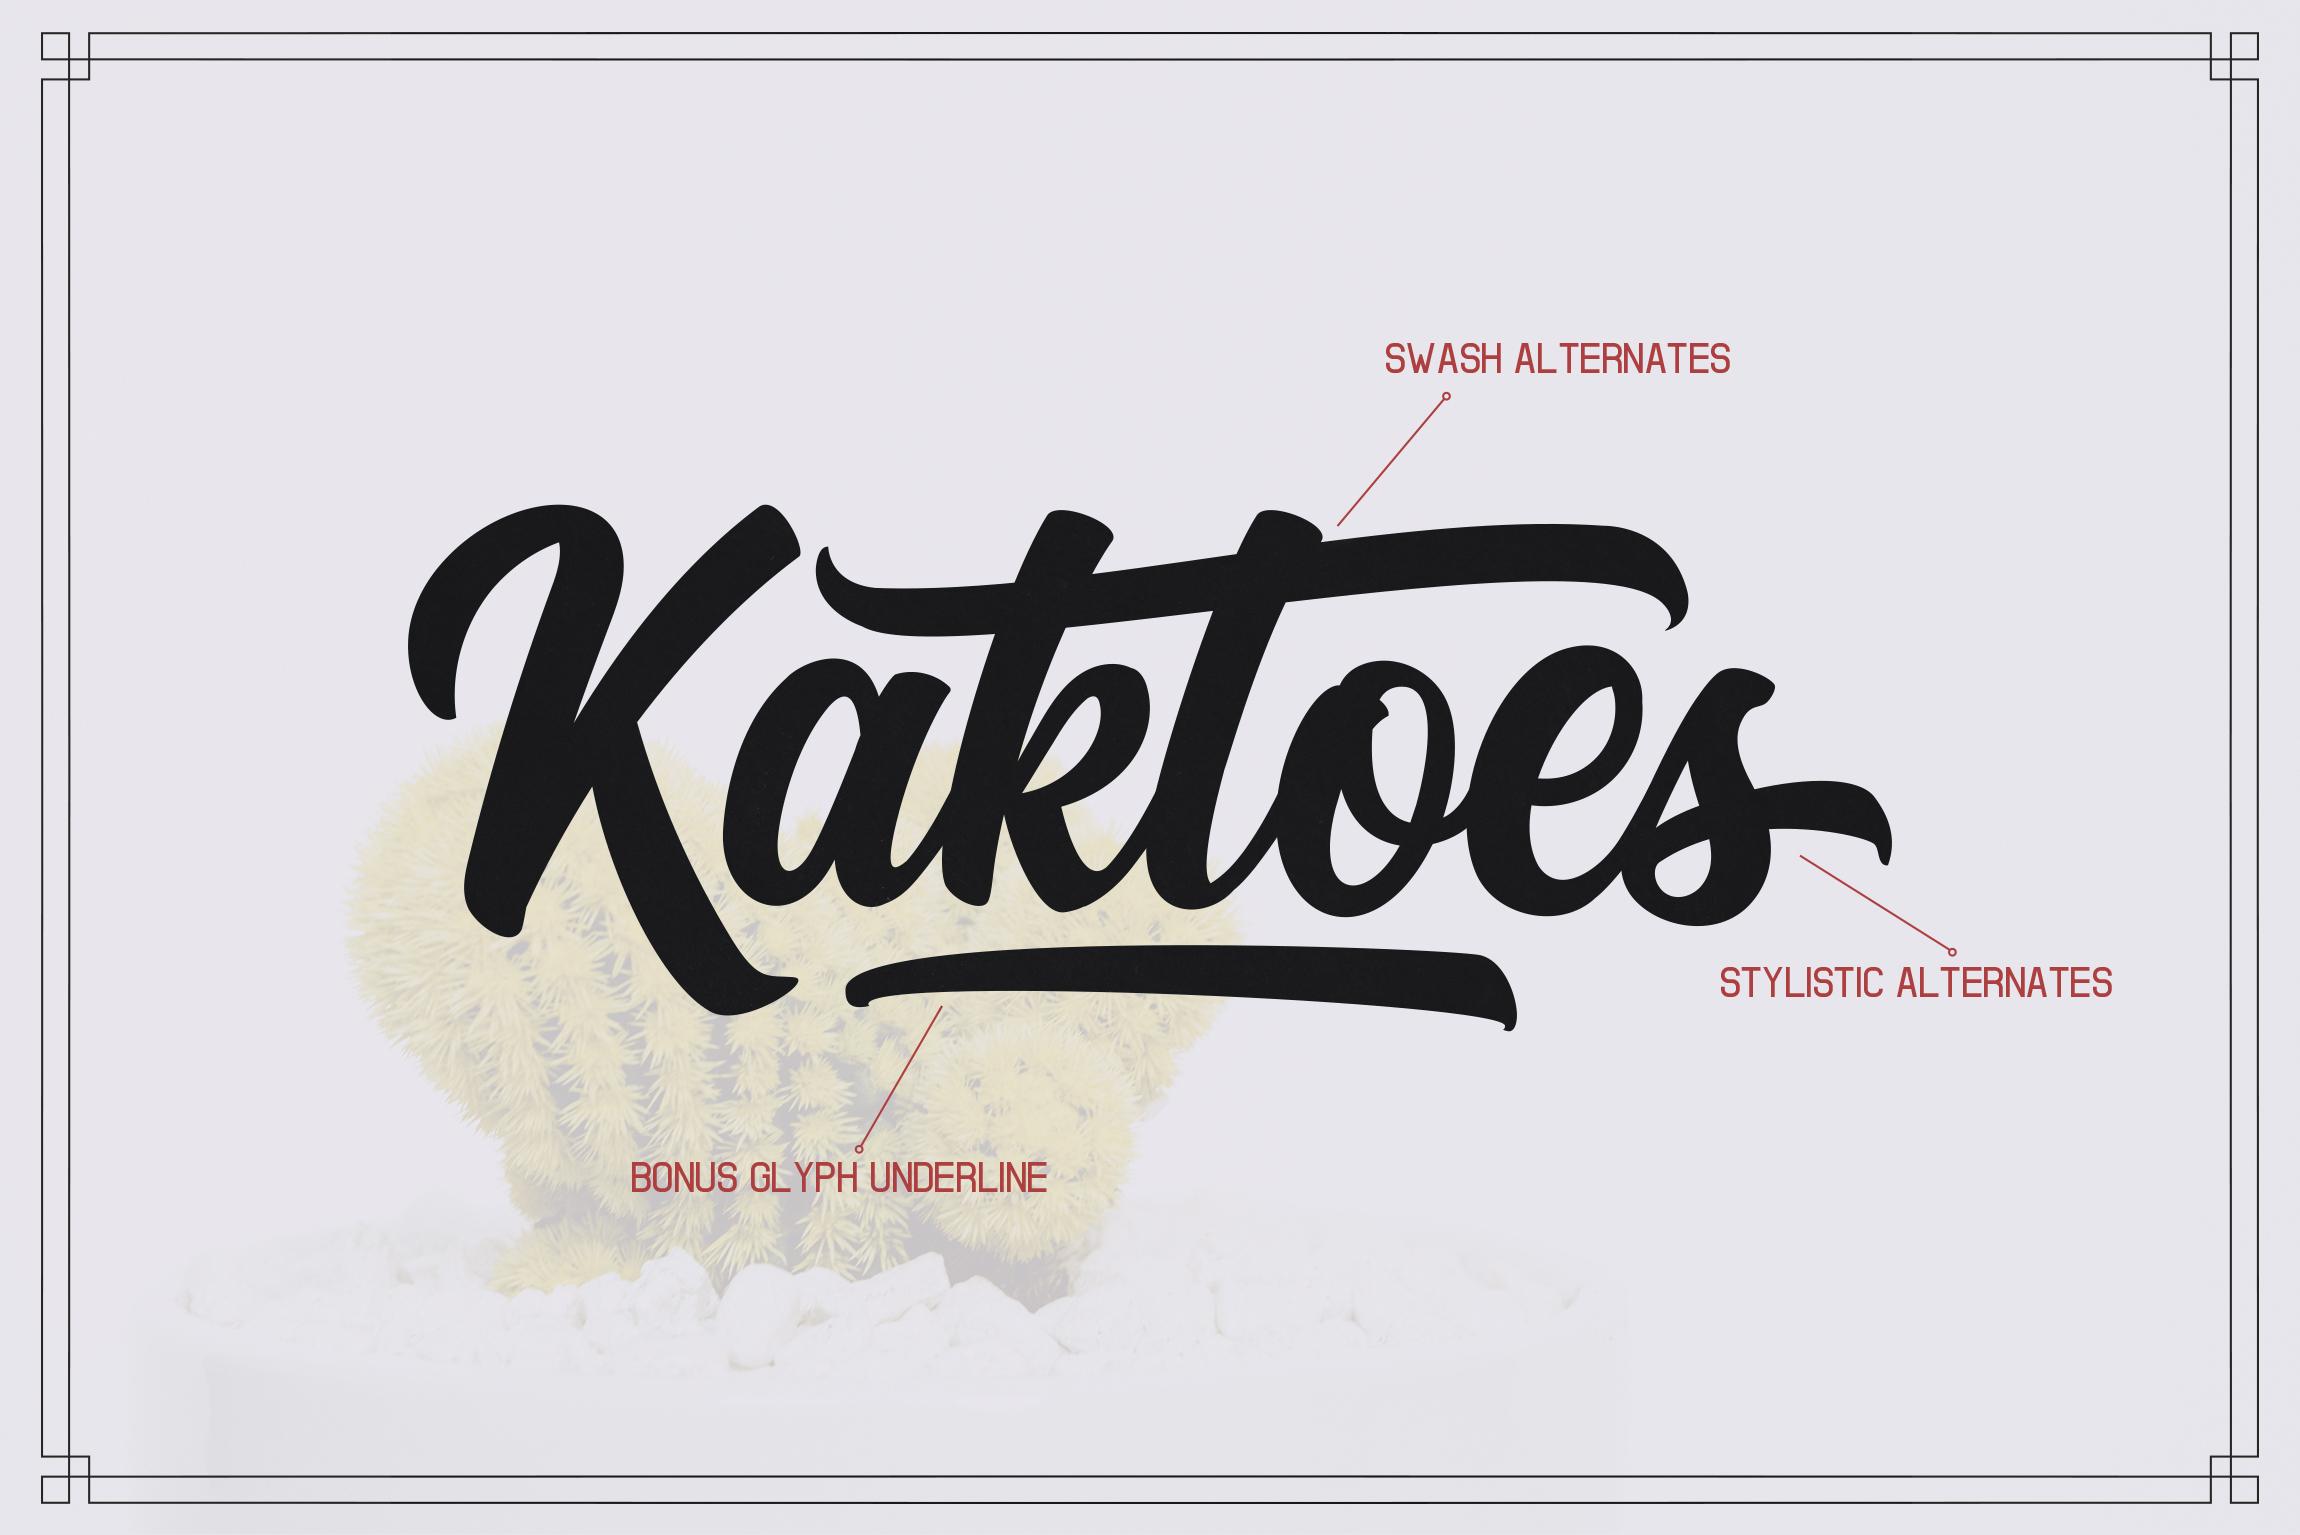 Kaktoes Script Font example image 2